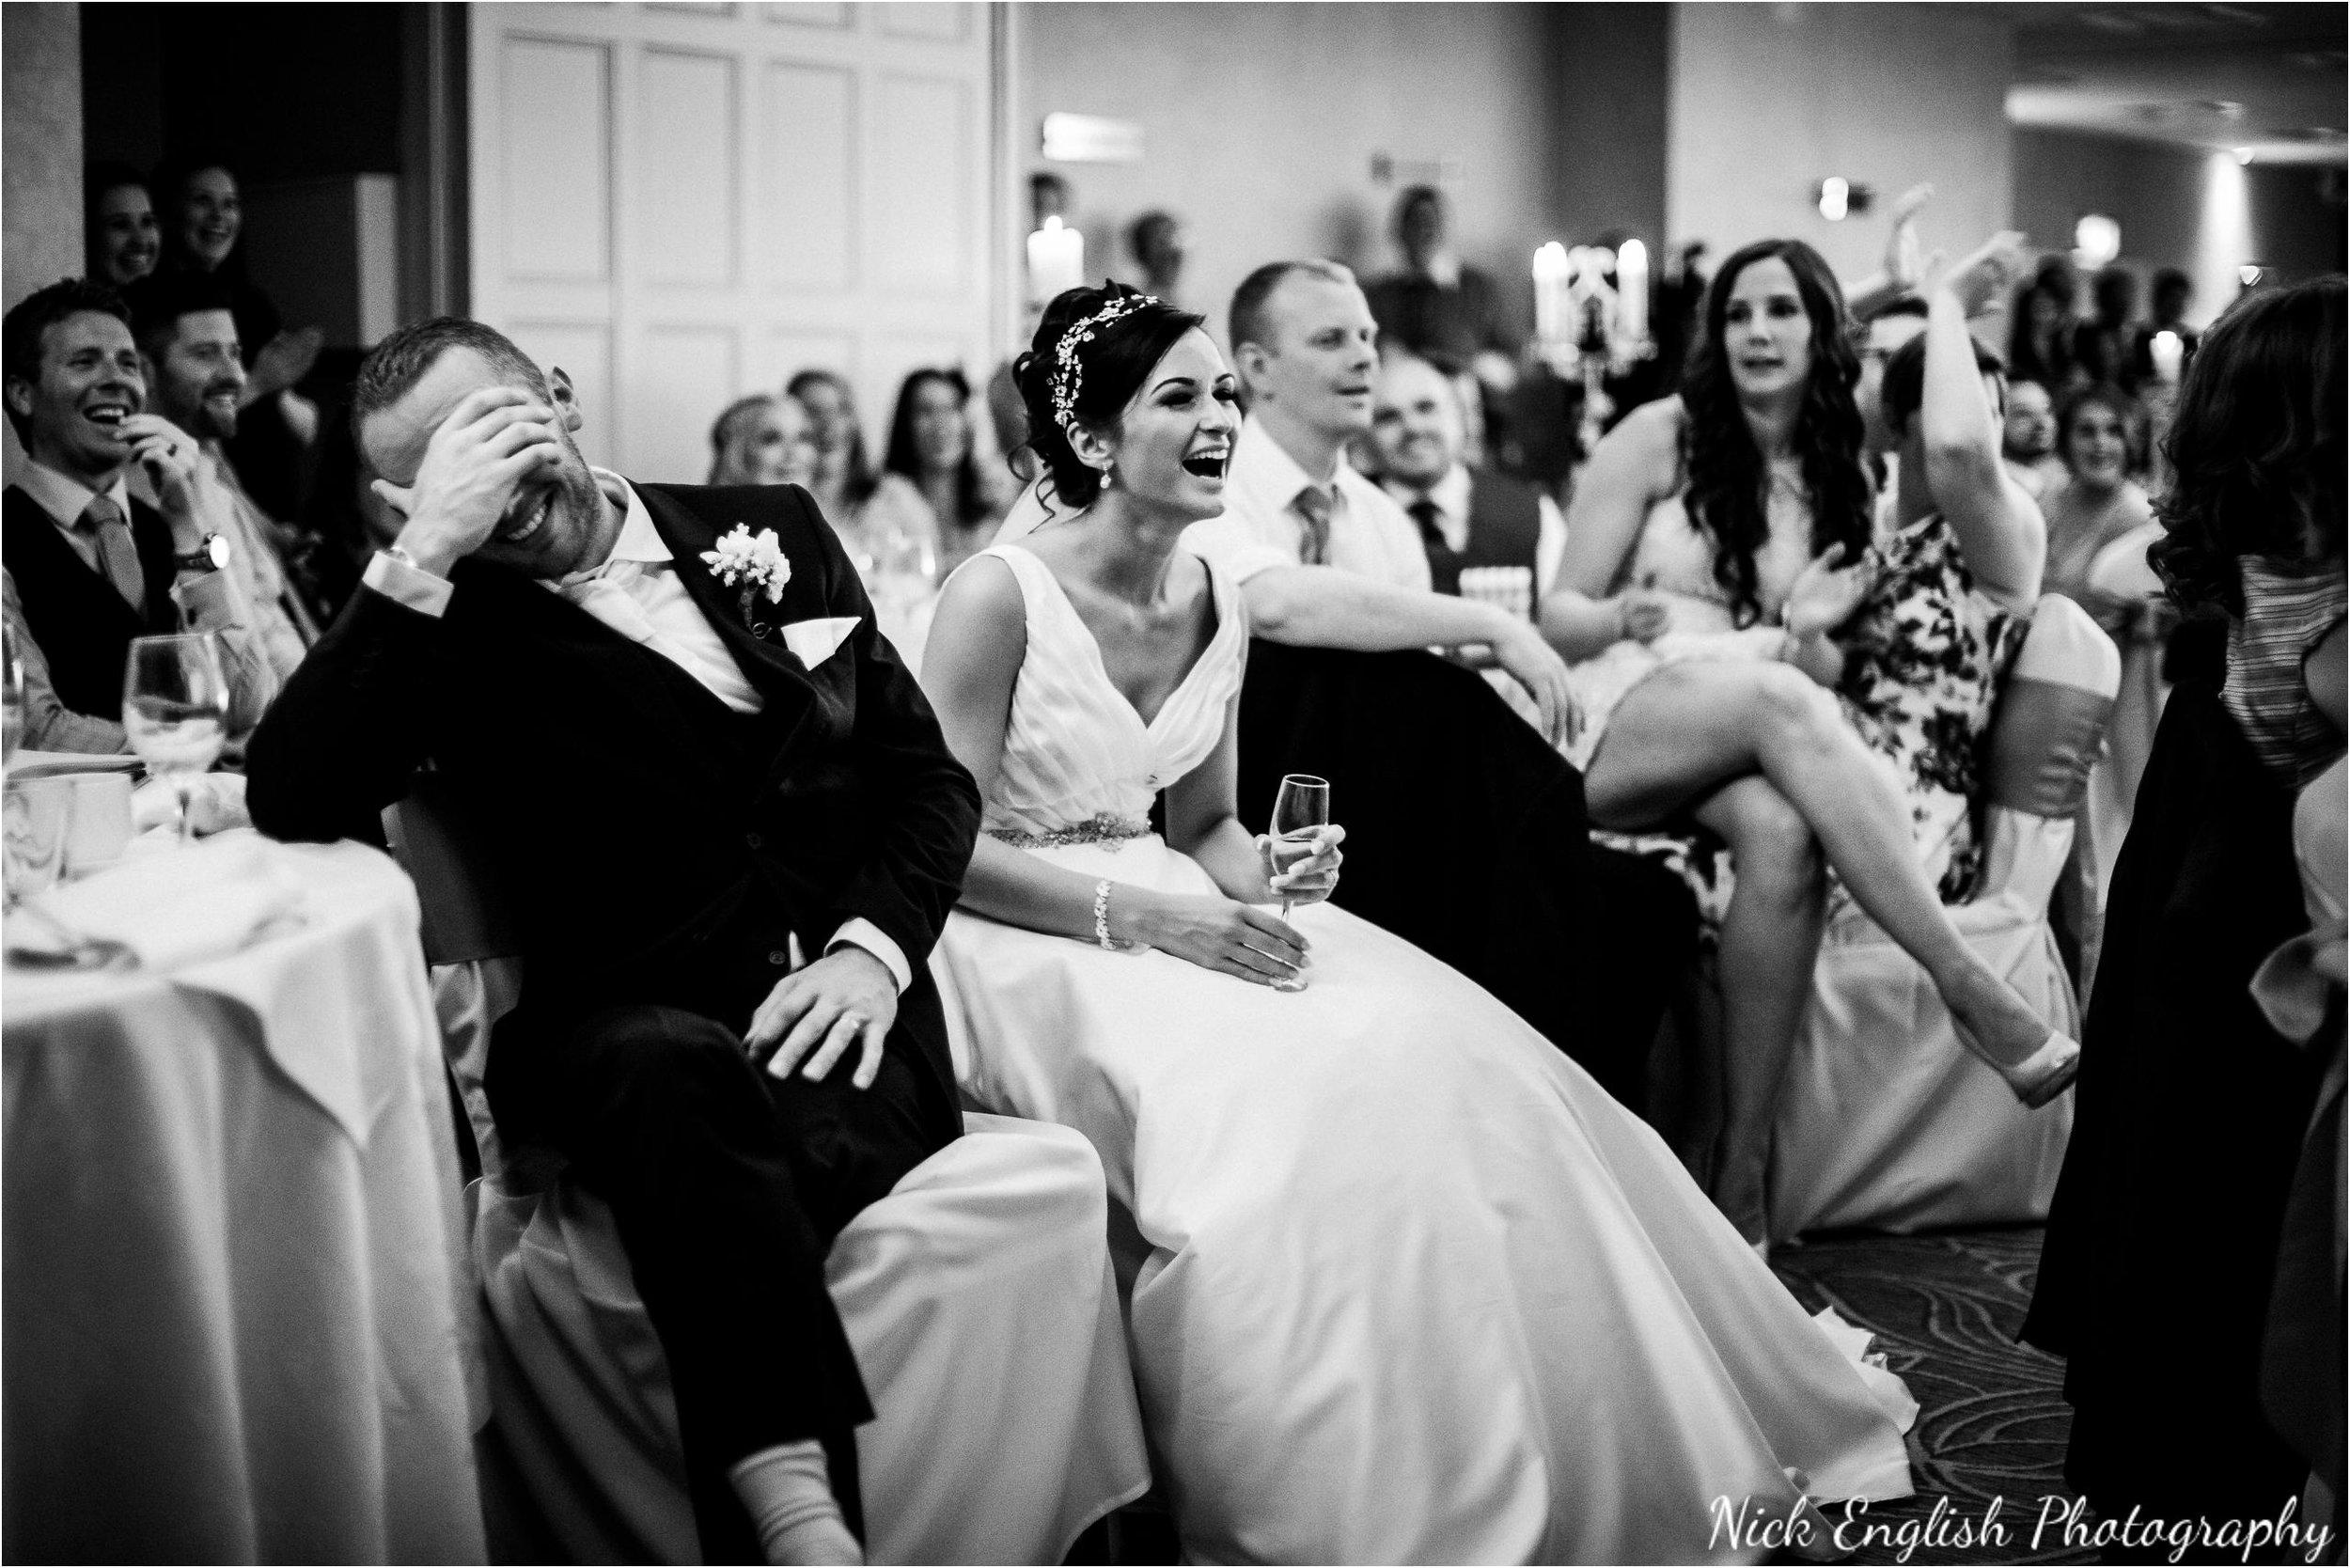 Emily David Wedding Photographs at Barton Grange Preston by Nick English Photography 184jpg.jpeg